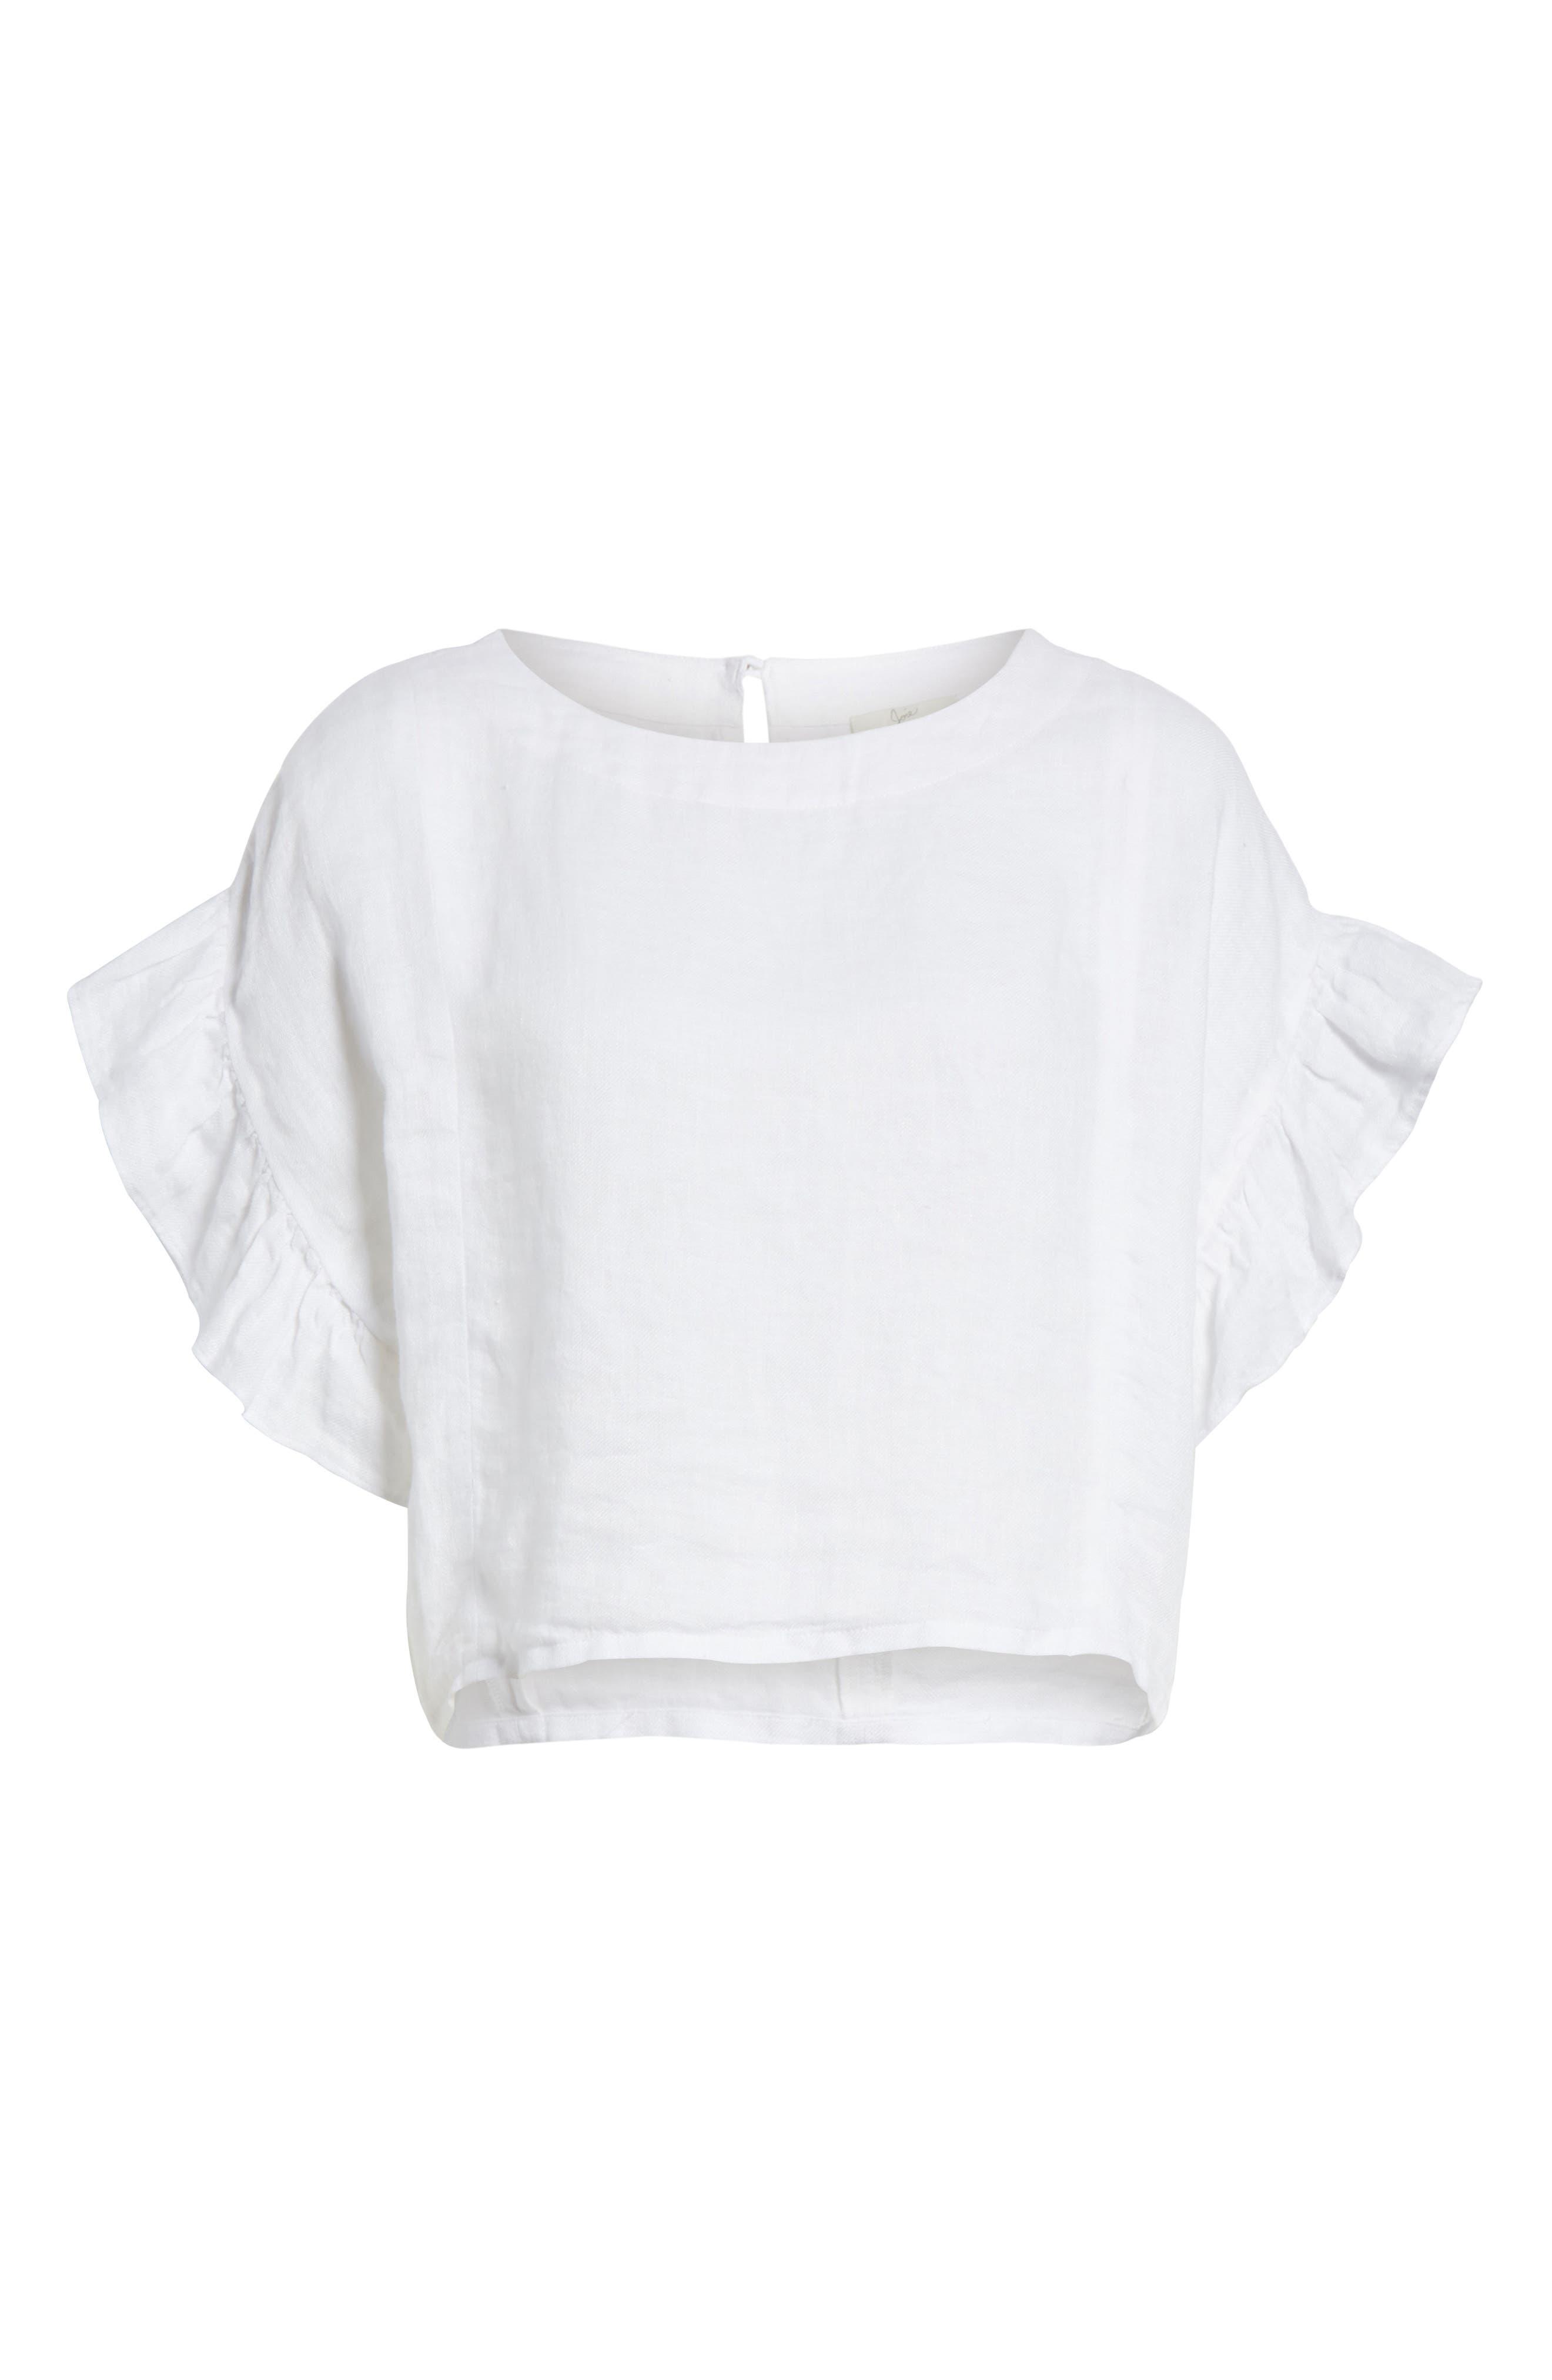 Febronia Ruffle Sleeve Linen Crop Top,                             Alternate thumbnail 6, color,                             120